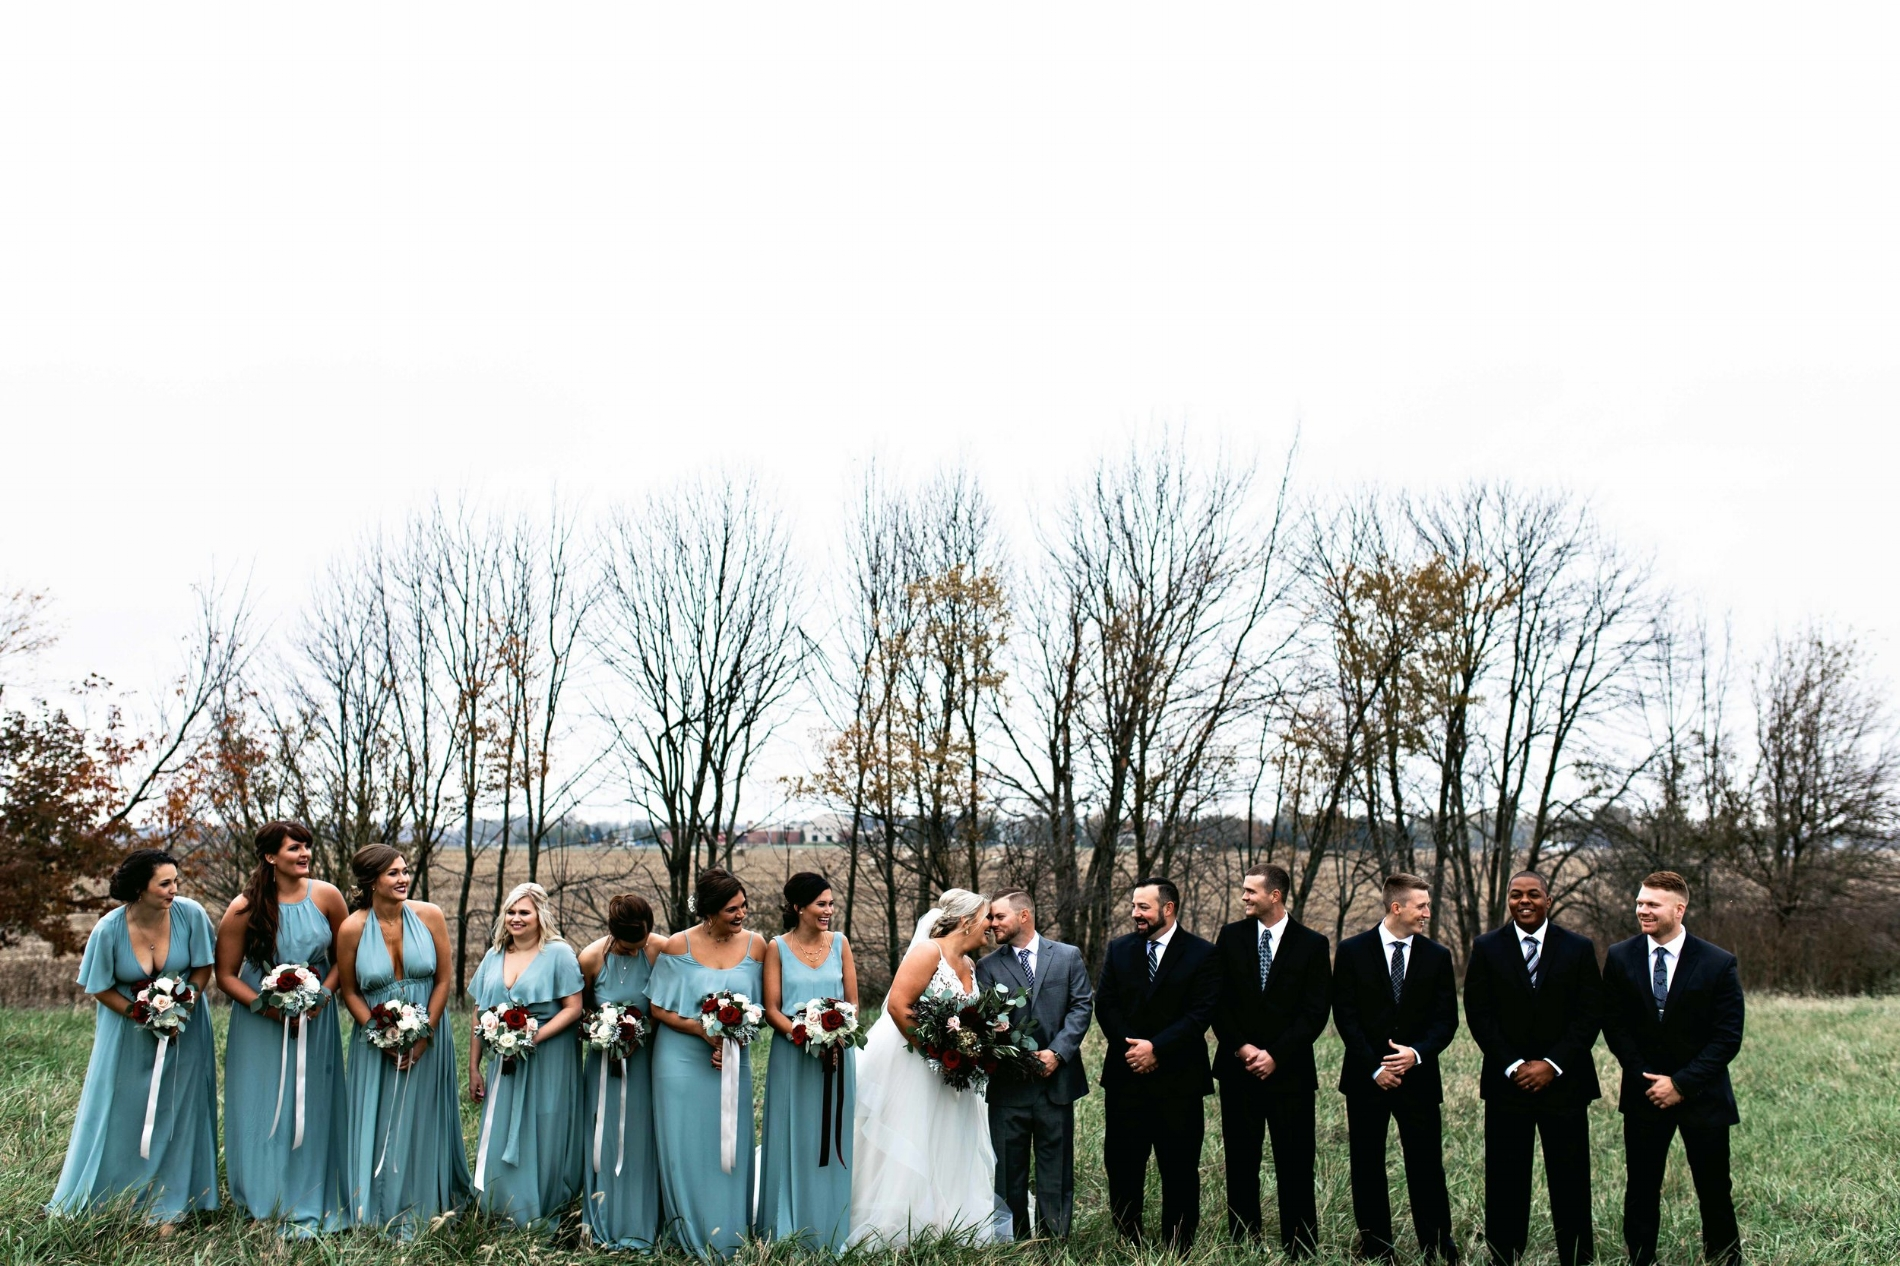 BridesbyYoung-Curvy-BlushHayleyPaige-Madi-Wedding-Inspiration-27.jpg